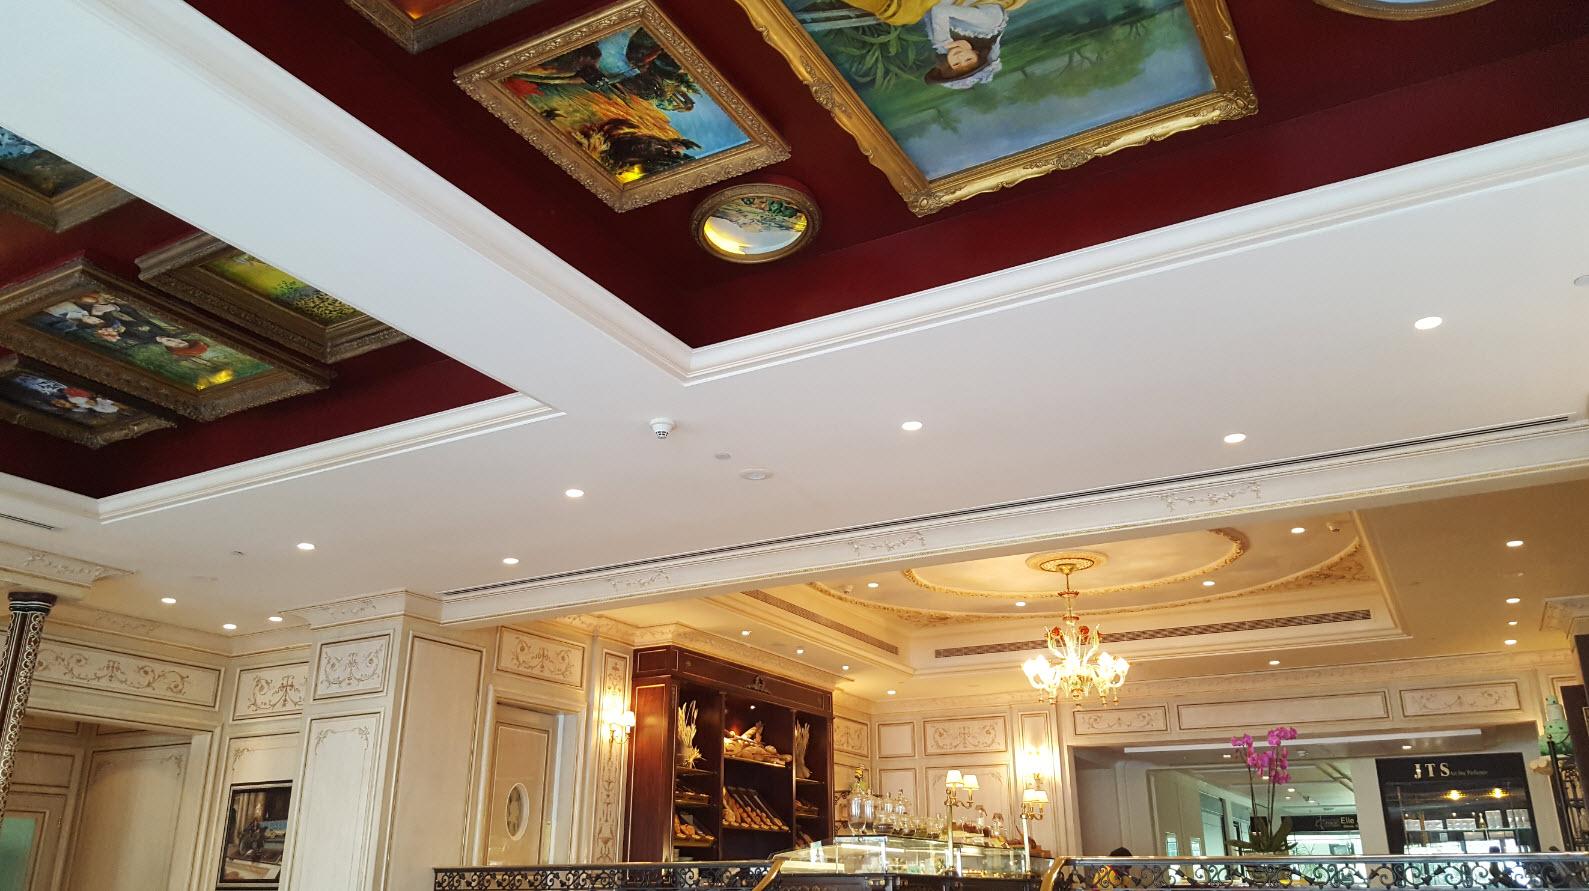 Peintures au plafond